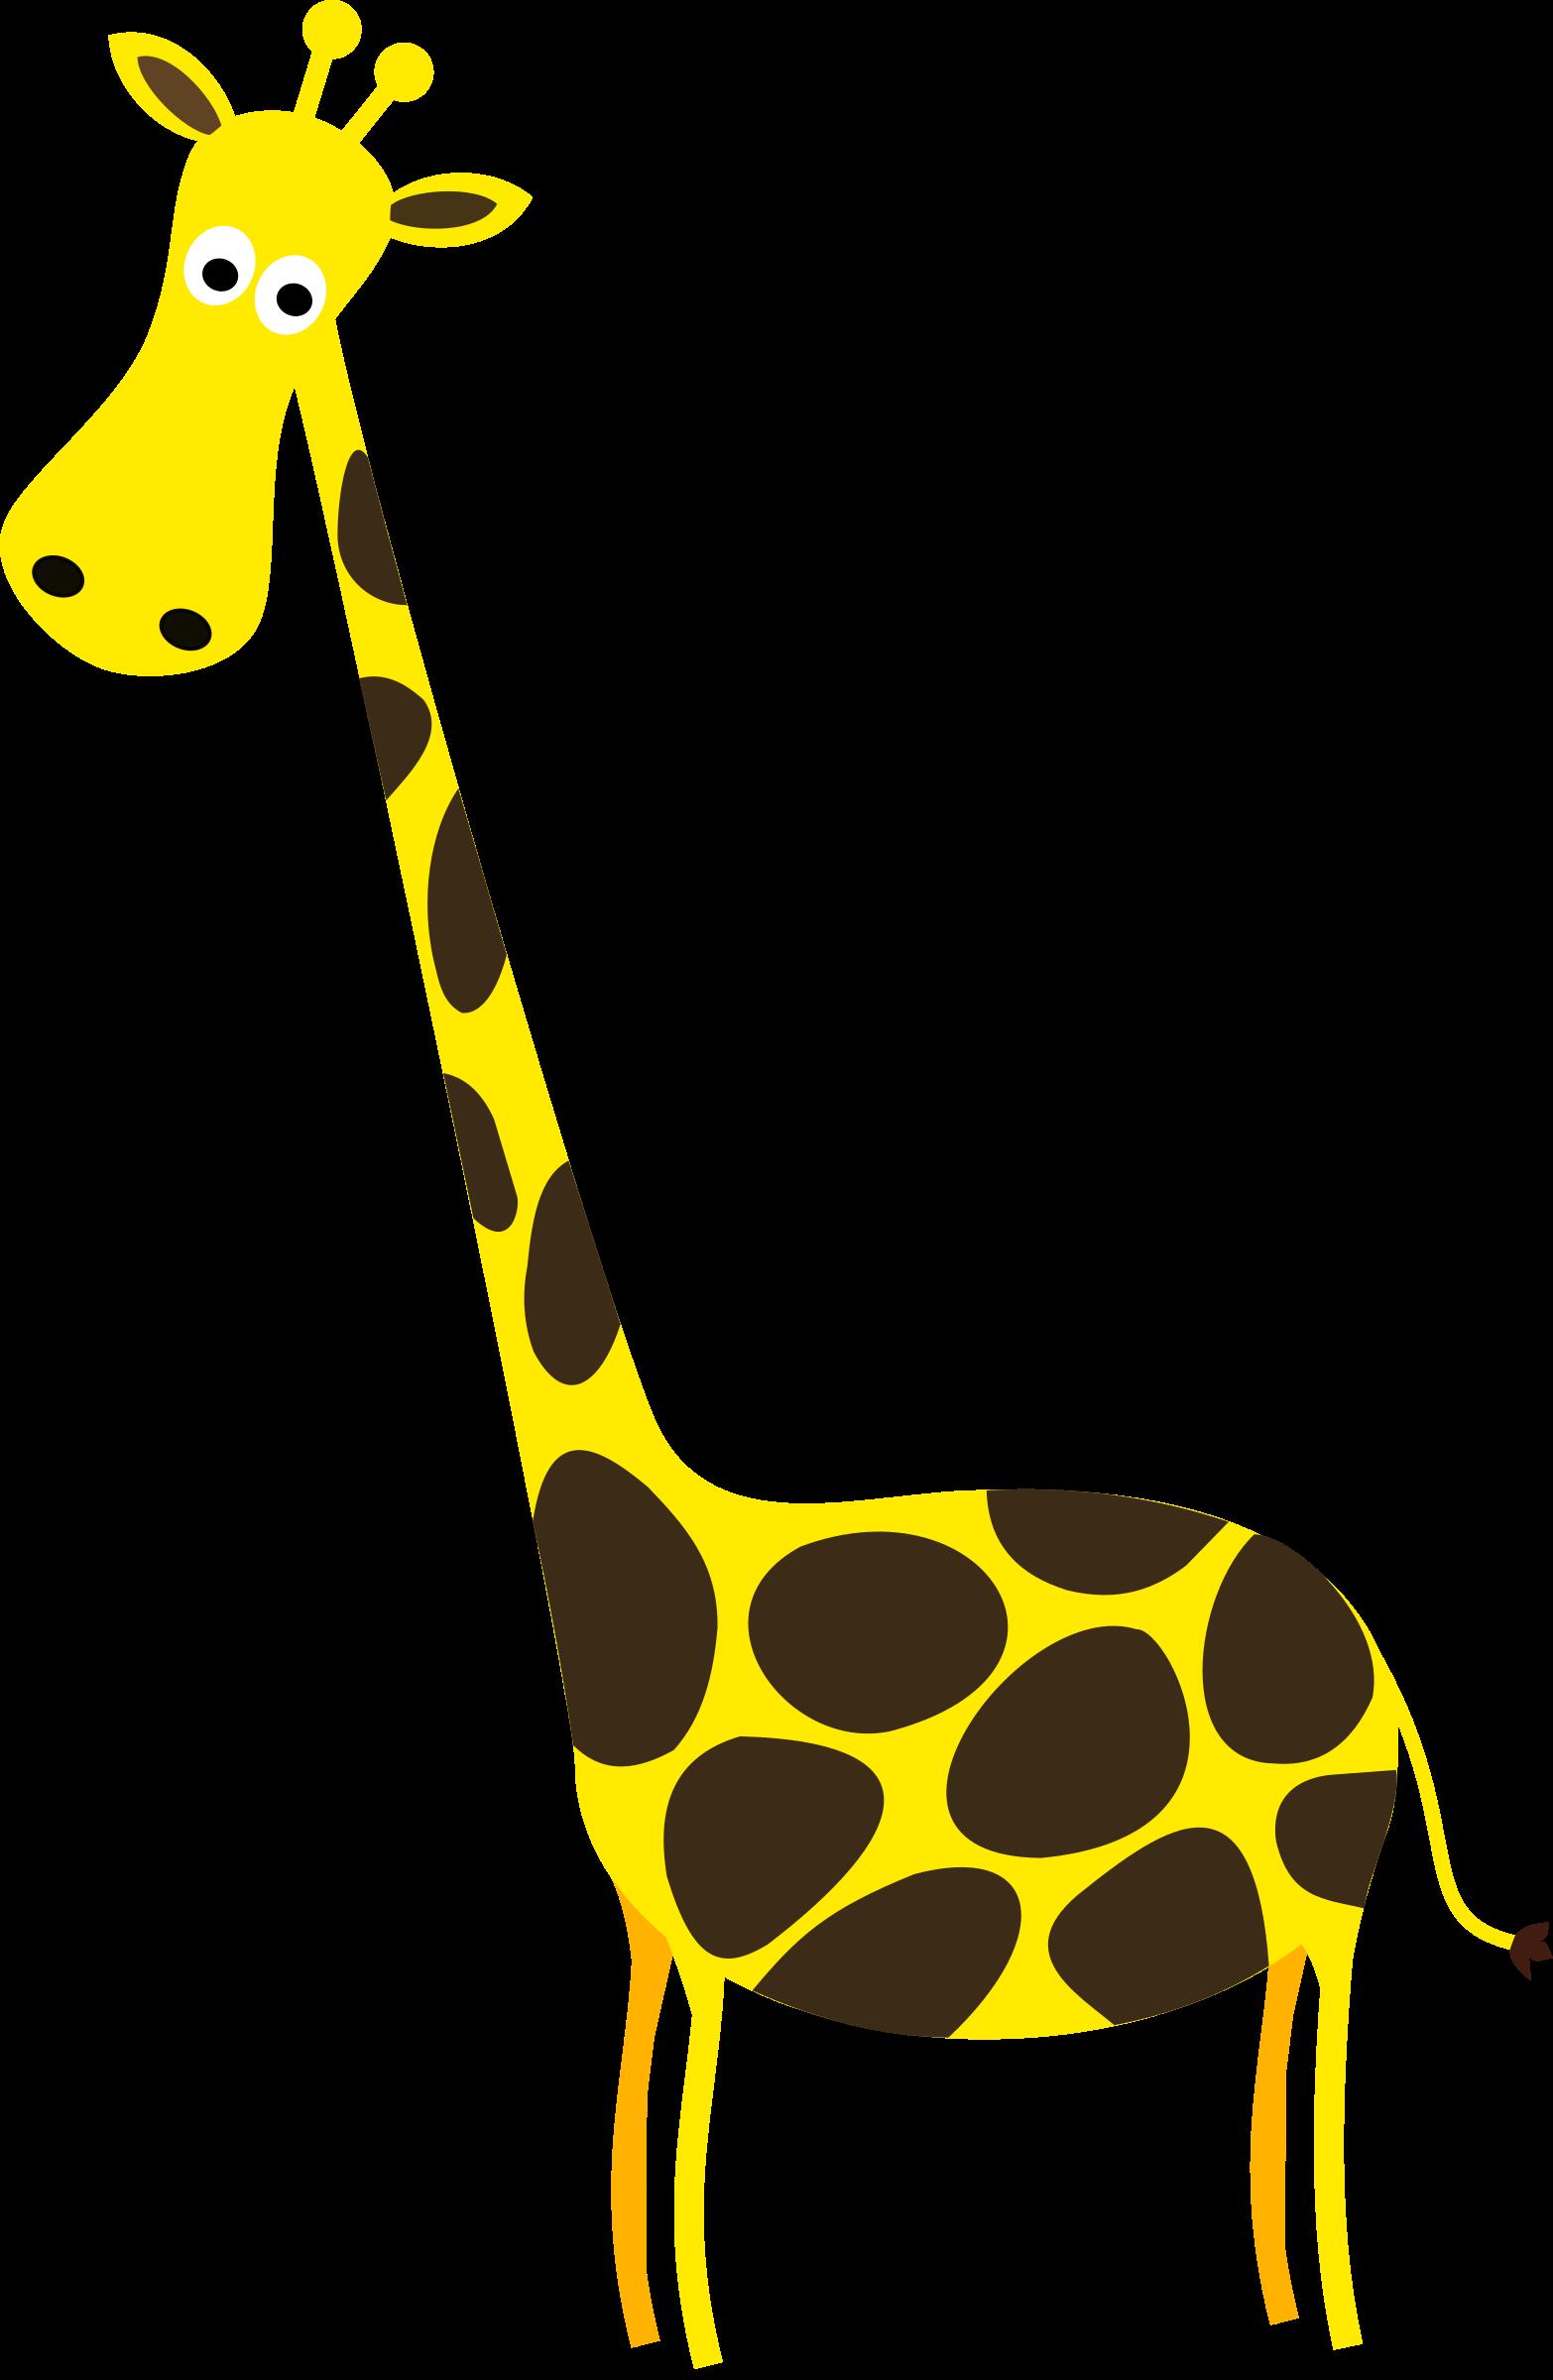 Giraffe sympa big image. Environment clipart animal